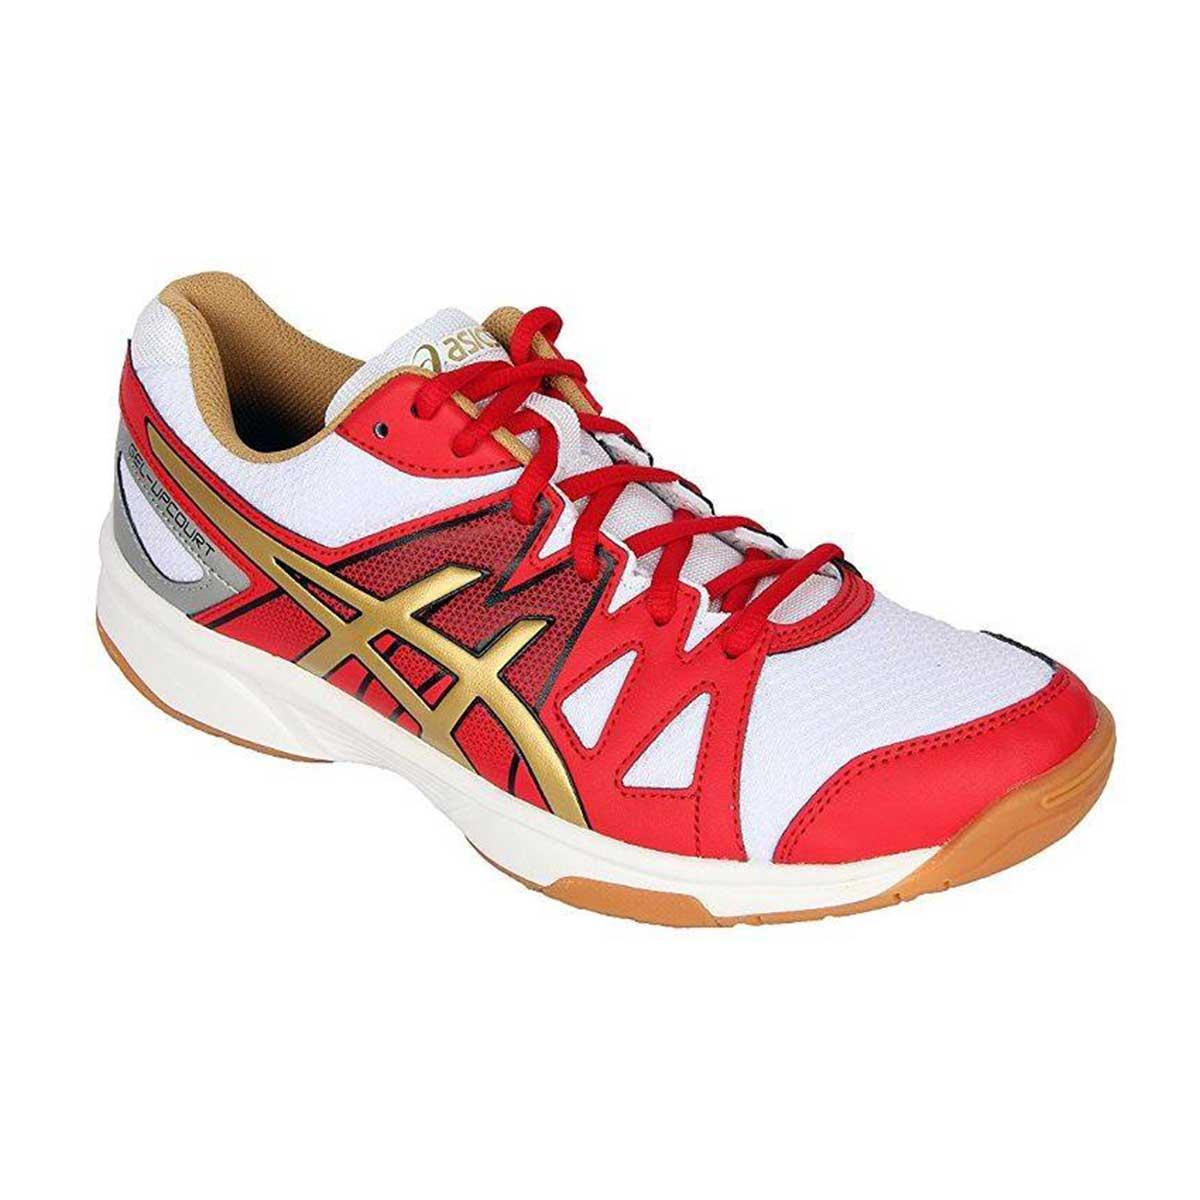 Buy Asics Gel Upcourt Squash Shoes White Gold Grey Online